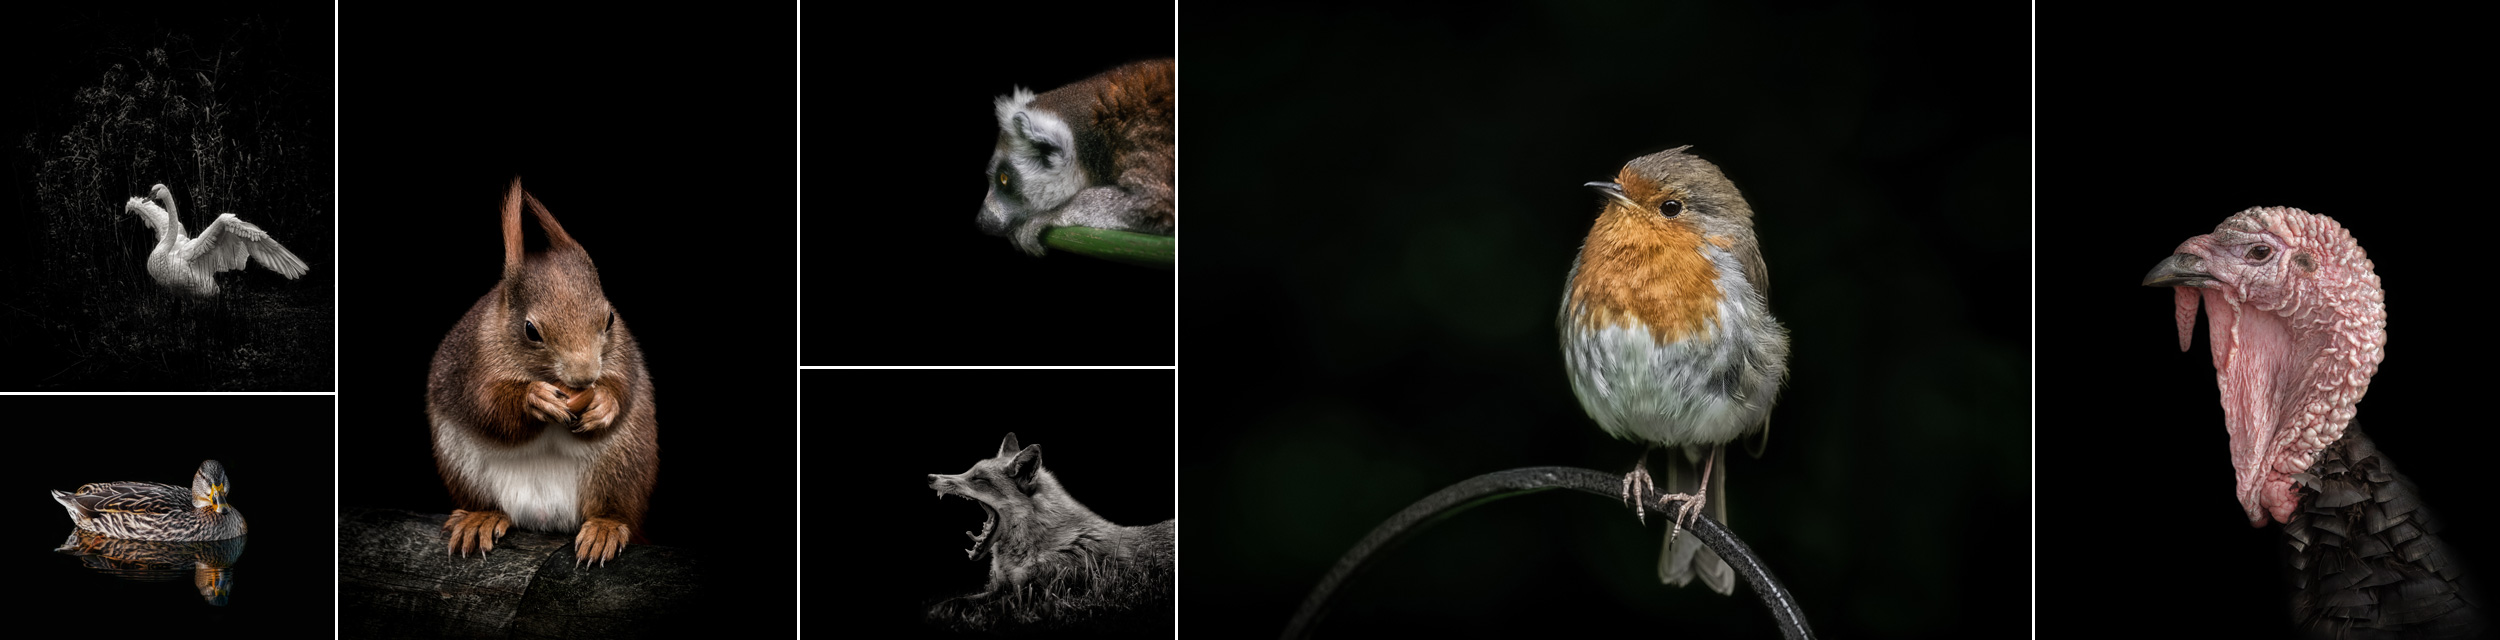 award winning wildlife and nature photographer surrey